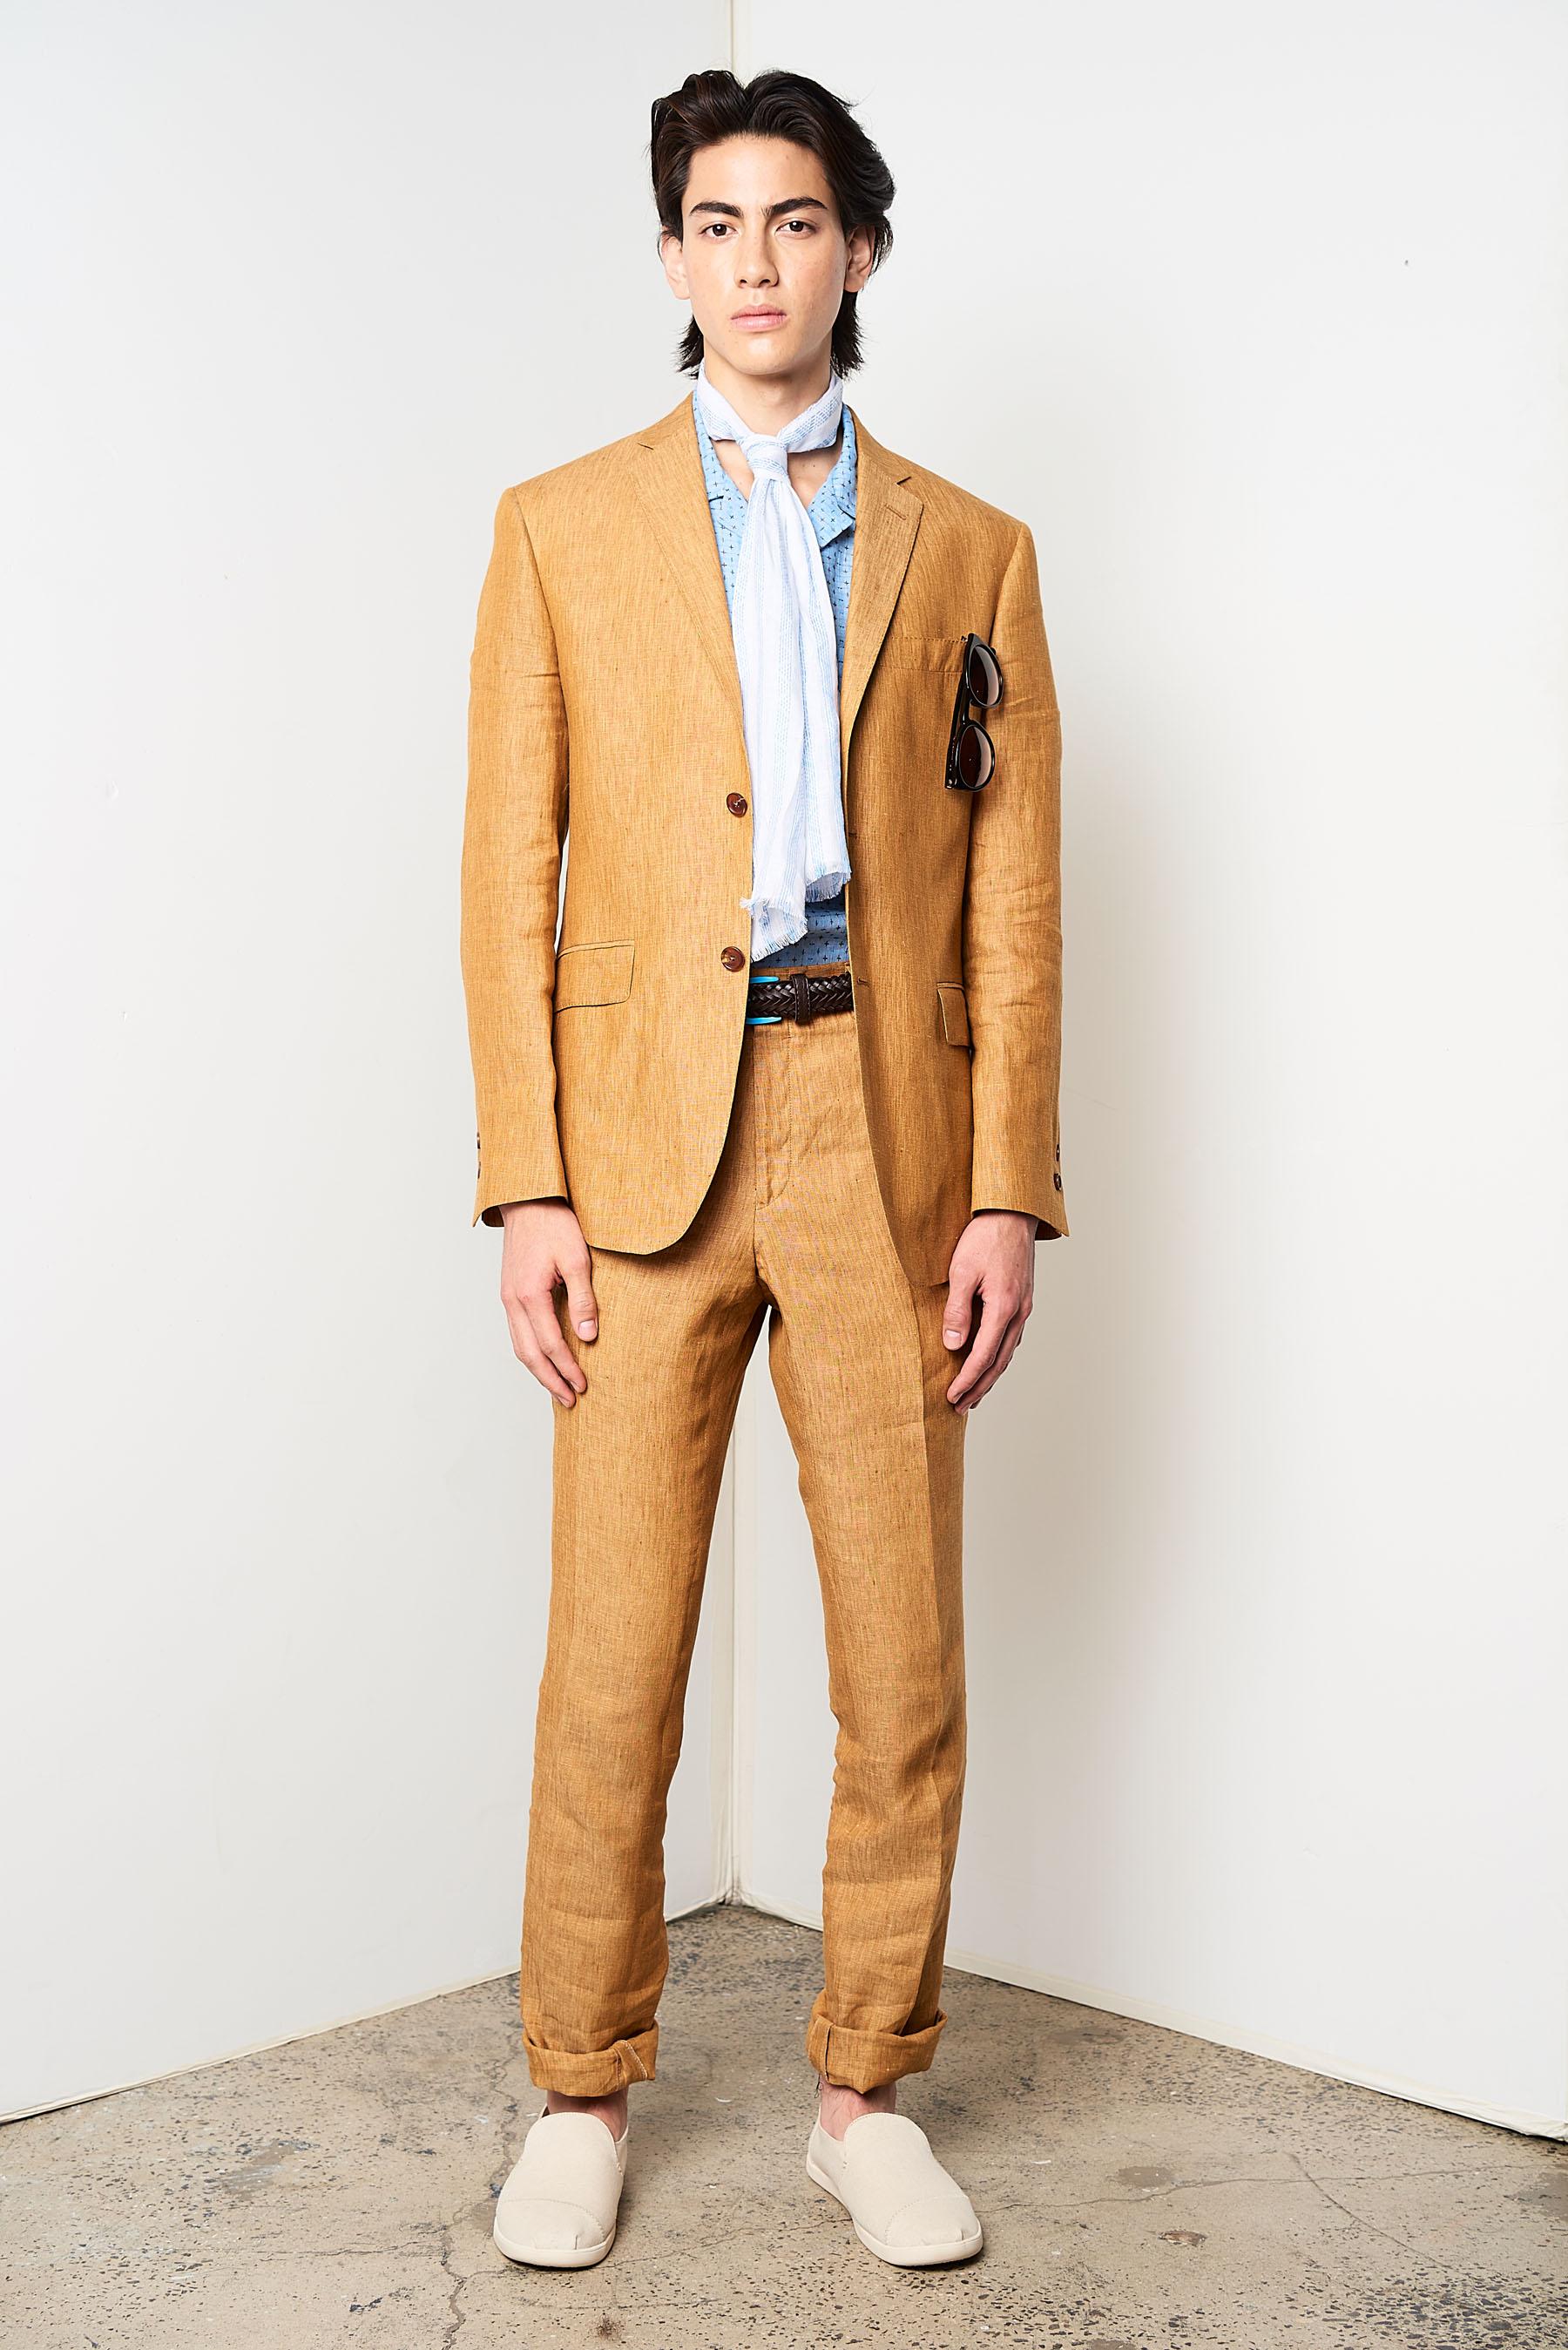 Men's Fashion Trends For 2018 FashionBeans 85